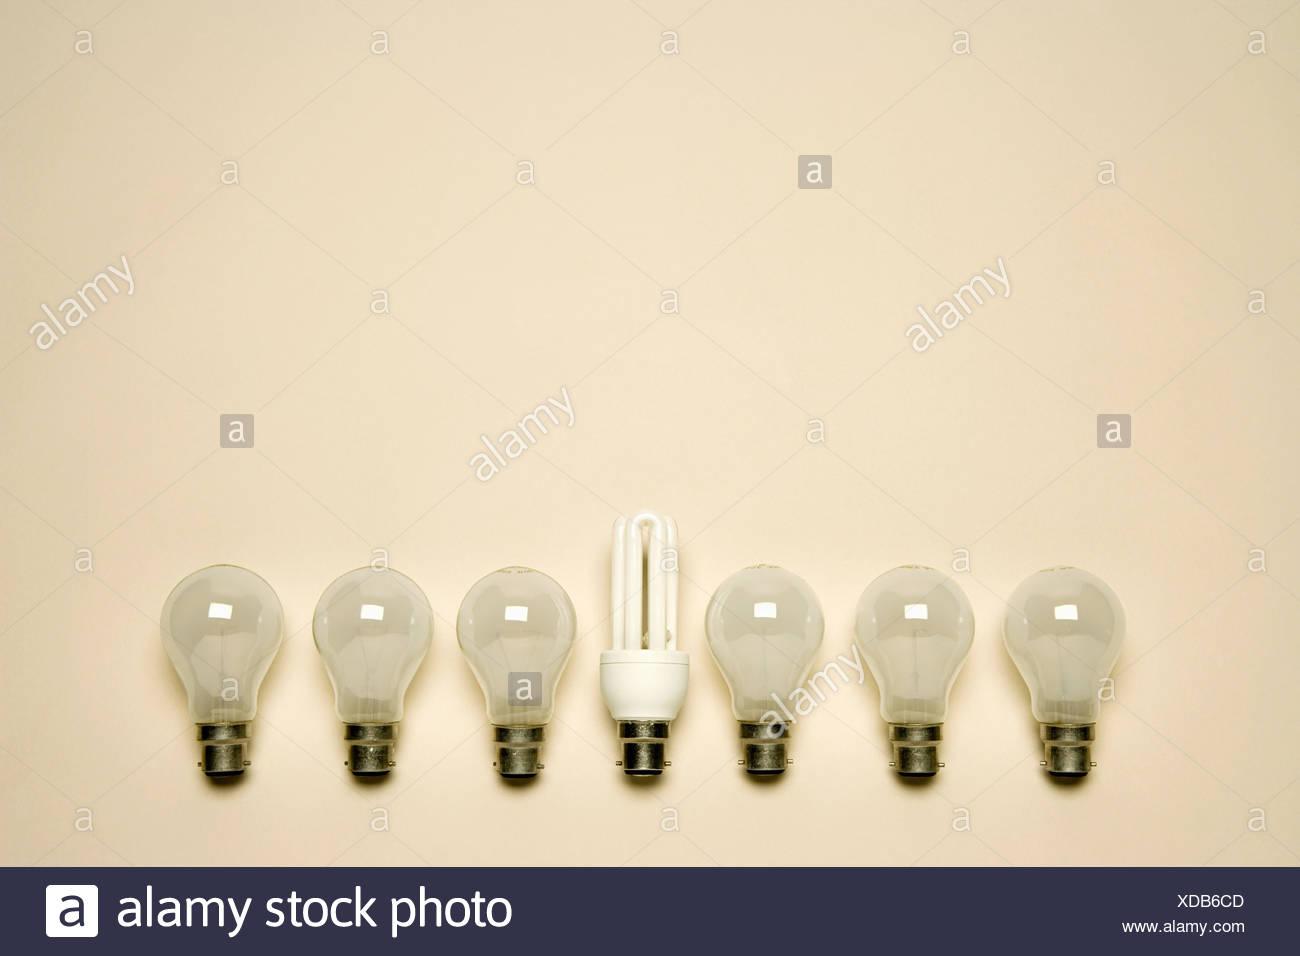 Lightbulbs in a row - Stock Image